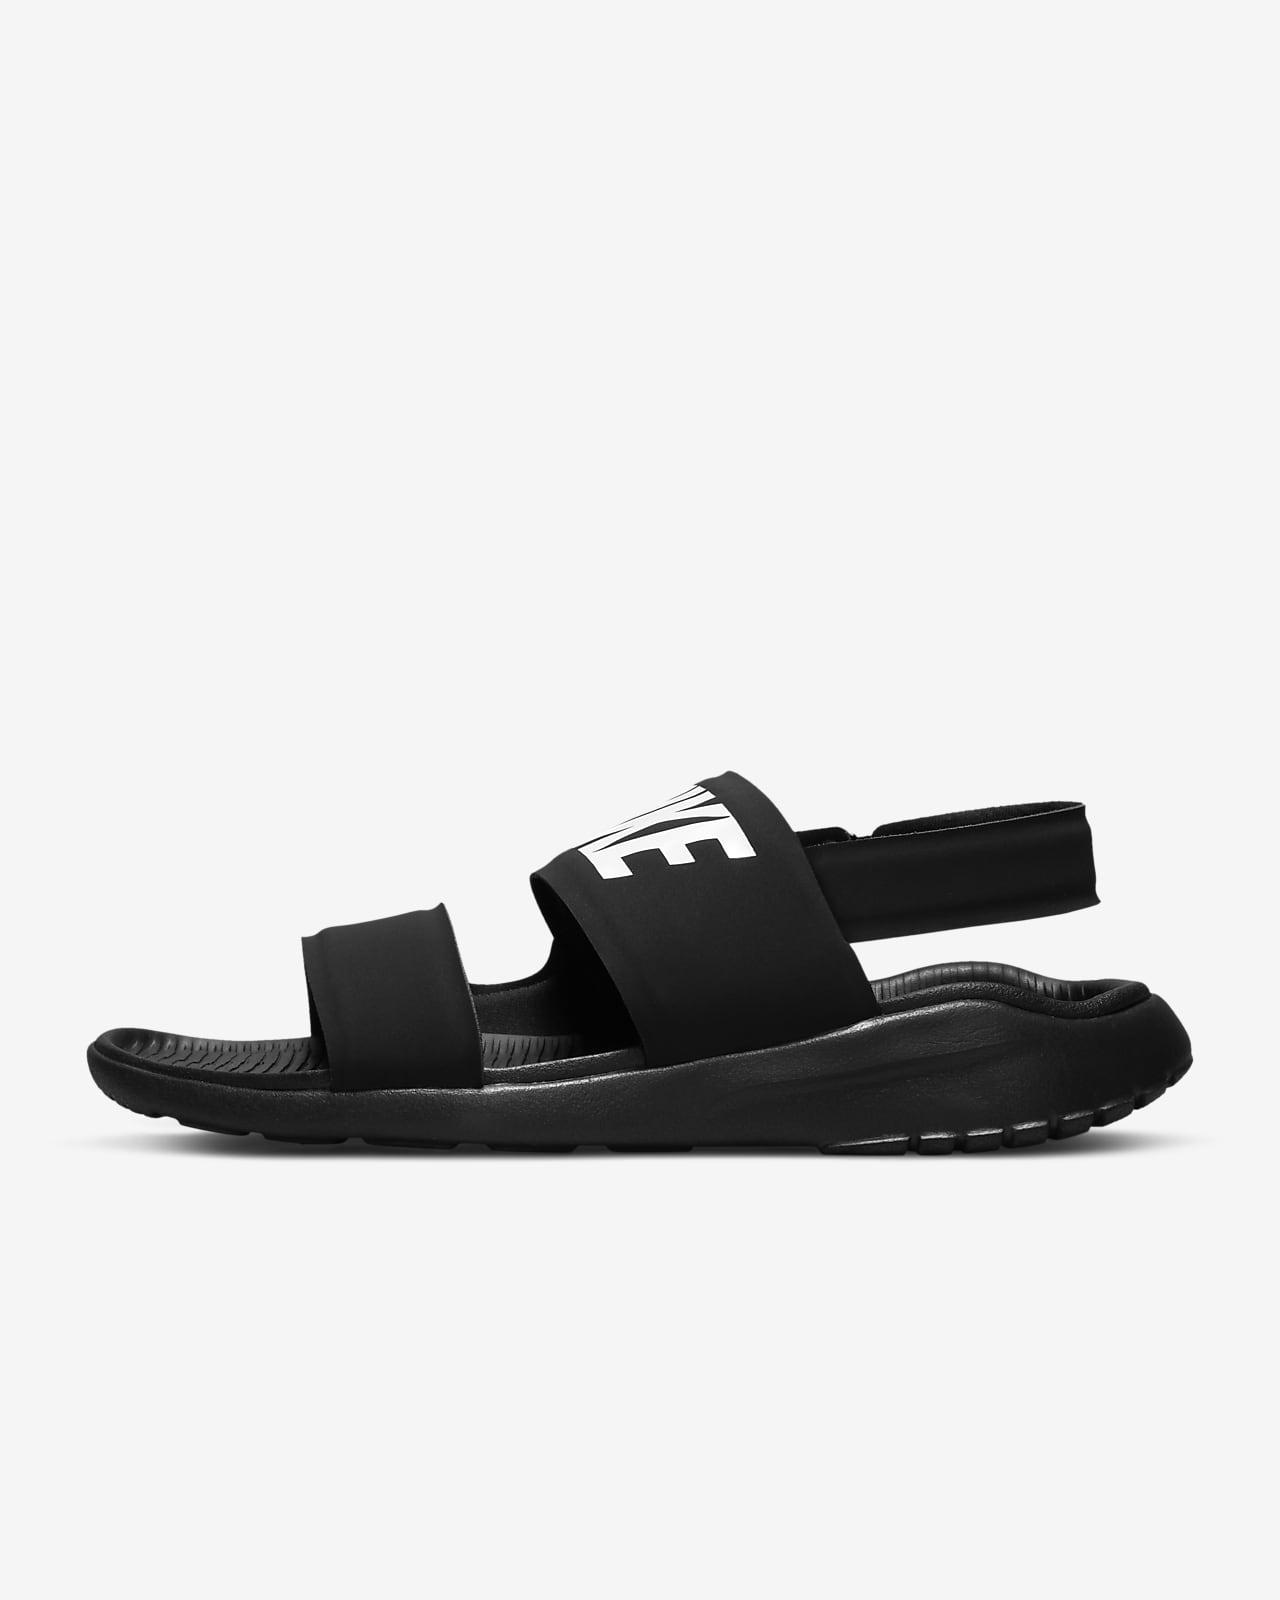 Nike Tanjun Women's Flip Flop